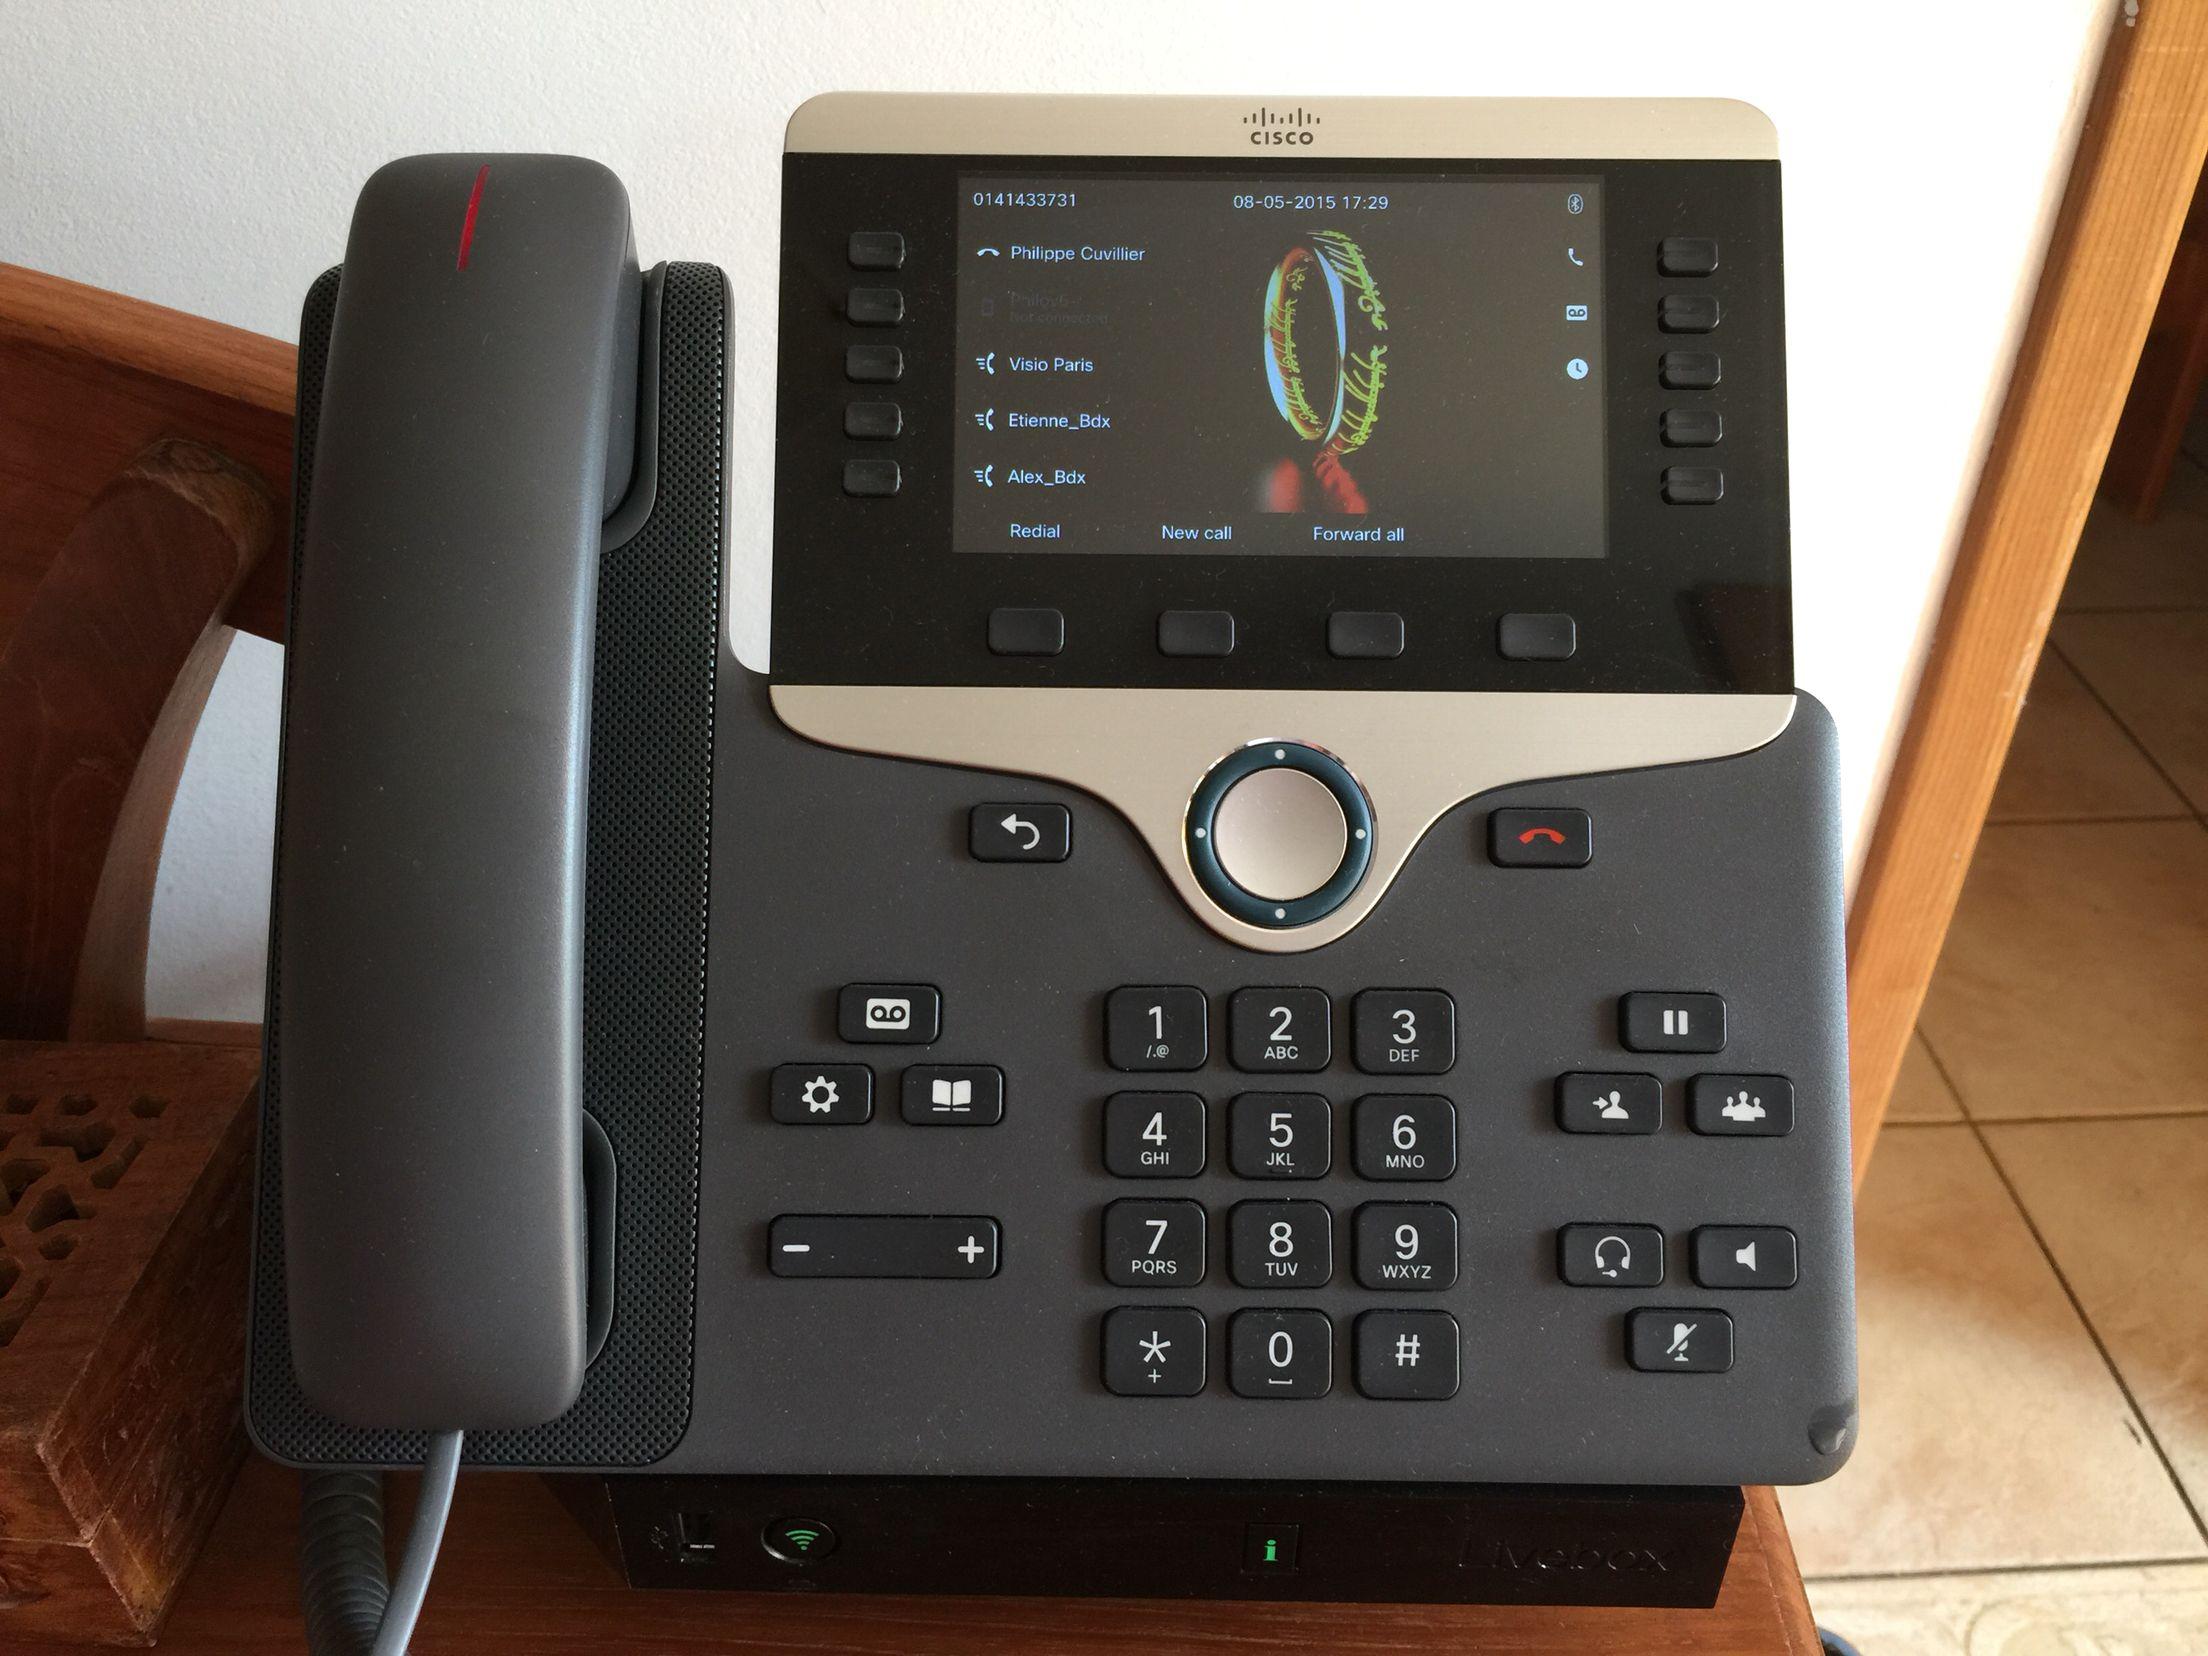 Cisco 8800 8851 vpn | Phones cisco 8800 | Phone, Office